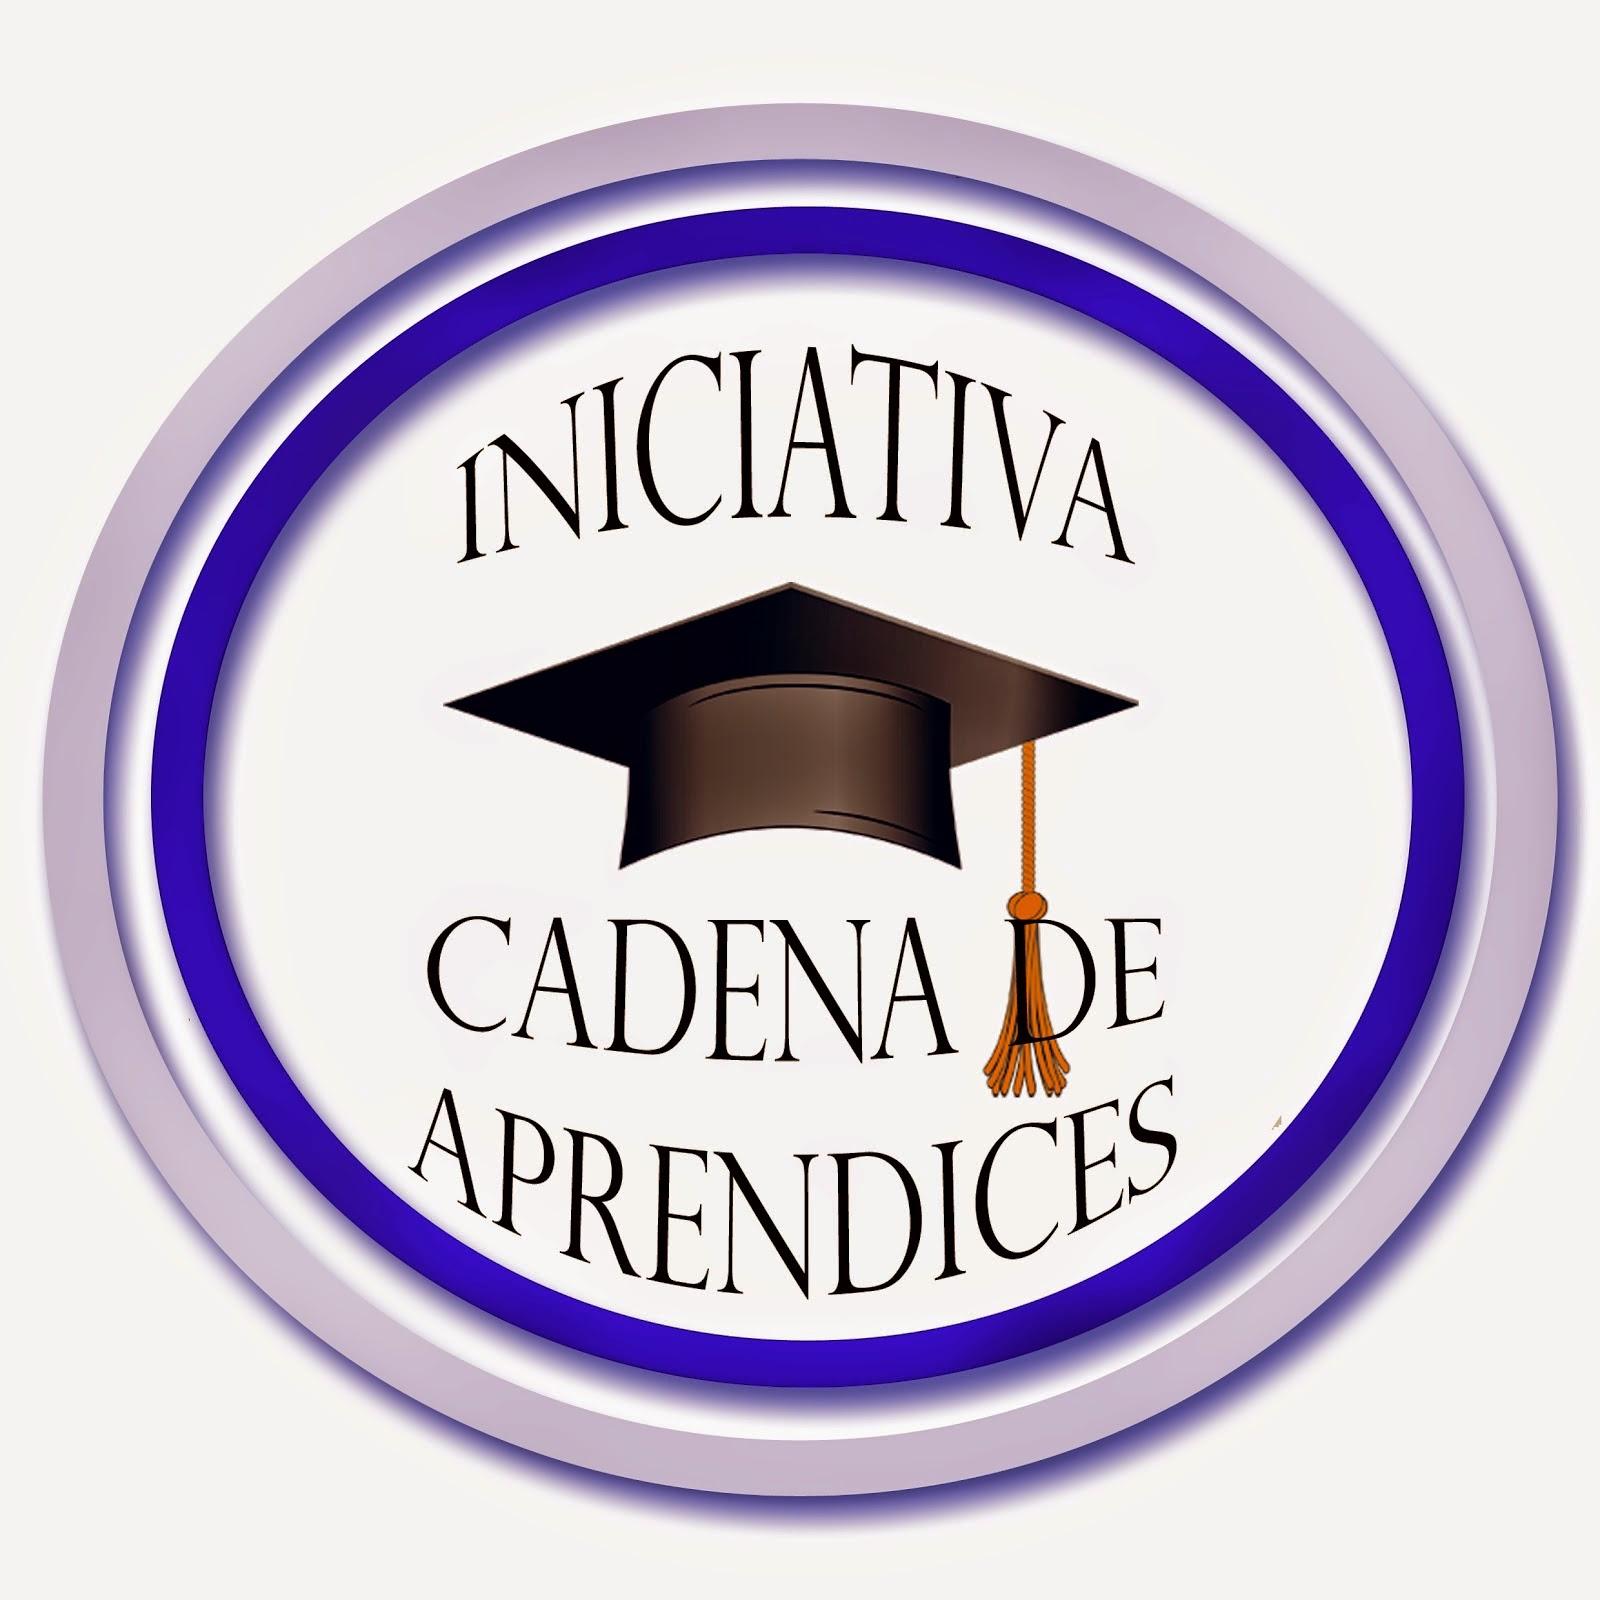 Iniciativa-Cadena de Aprendices